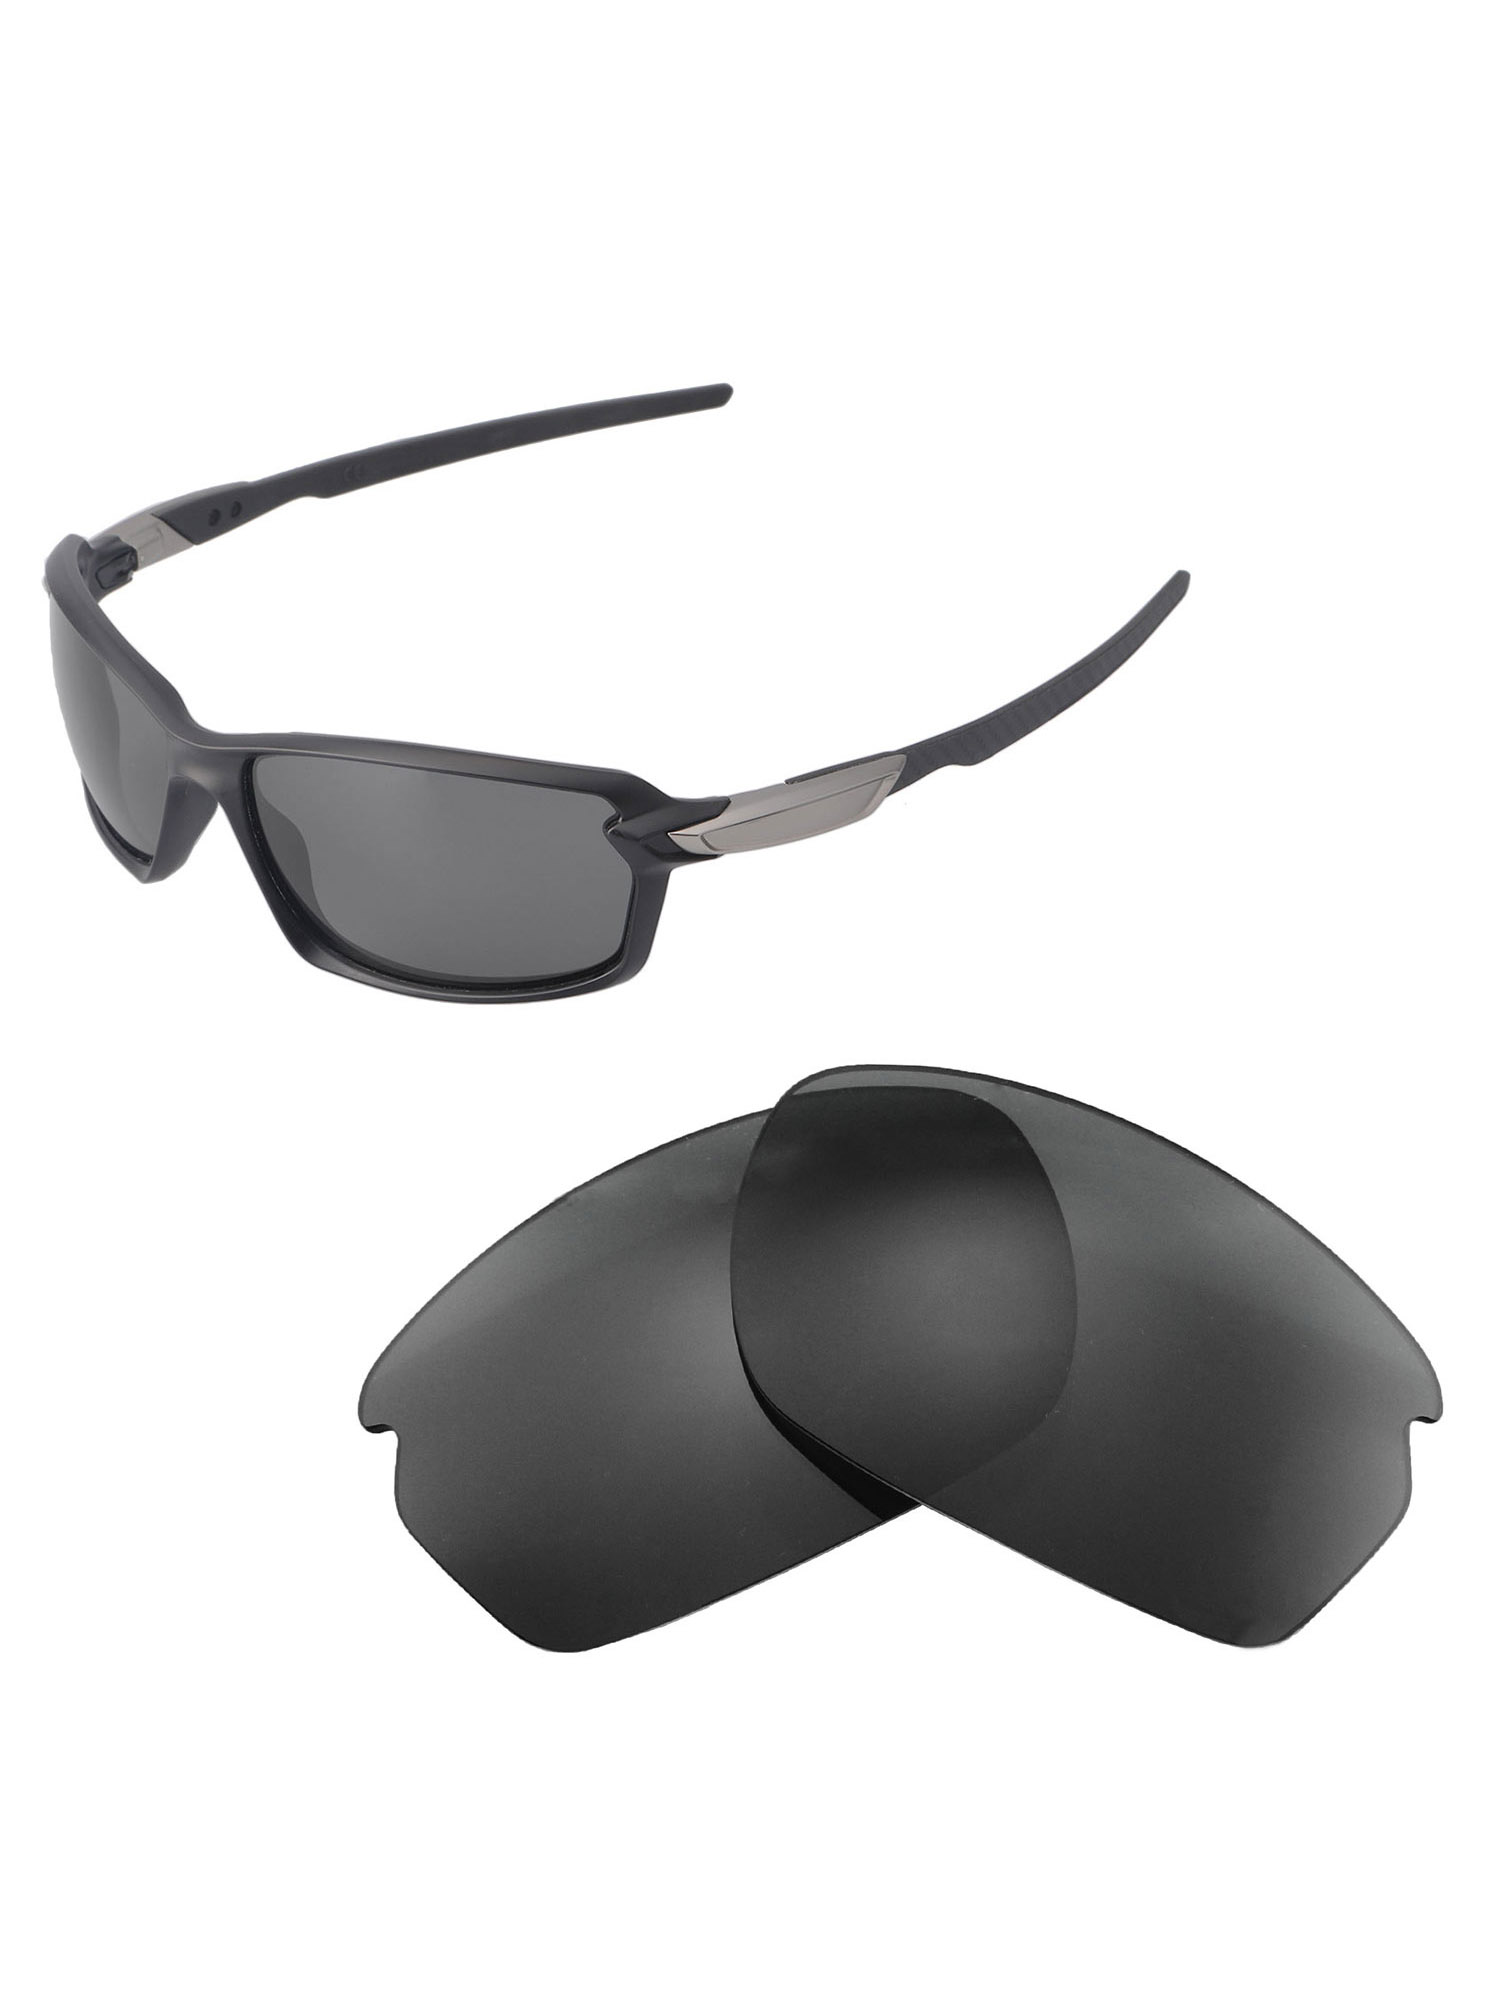 3697a7ffa8395 Walleva - Walleva Ice Blue Replacement Lenses for Oakley Carbon Shift  Sunglasses - Walmart.com